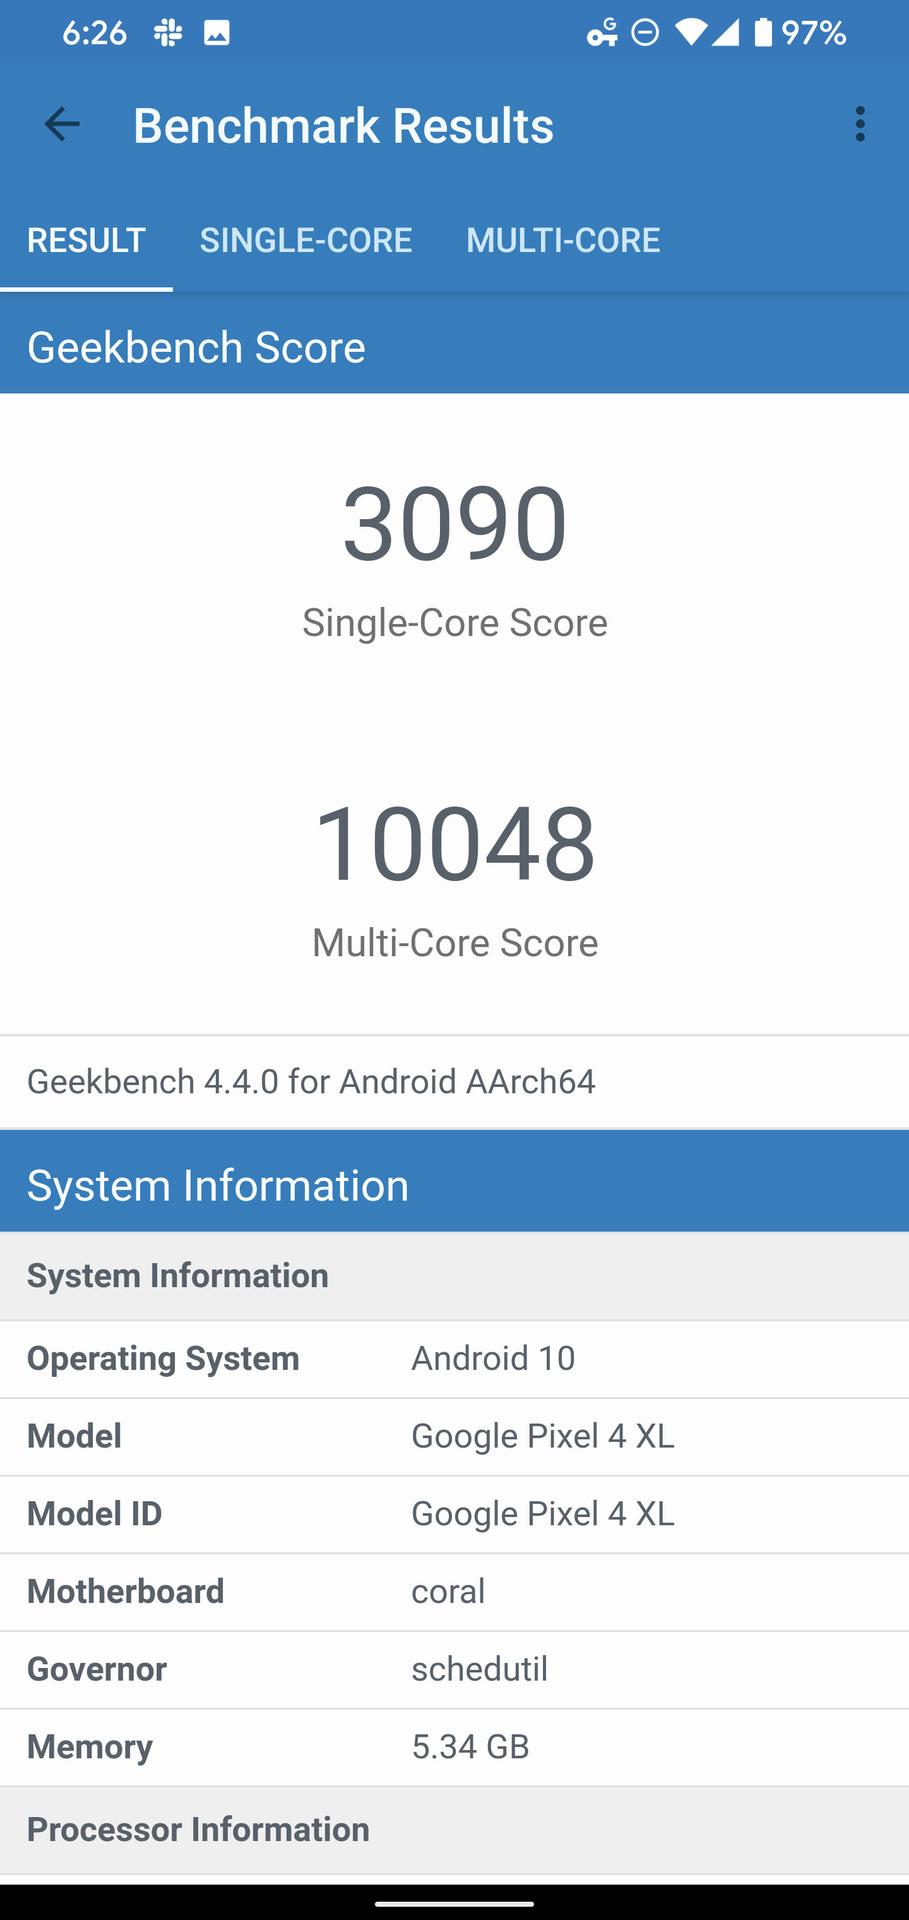 Google Pixel 4 XL Geekbench benchmark results